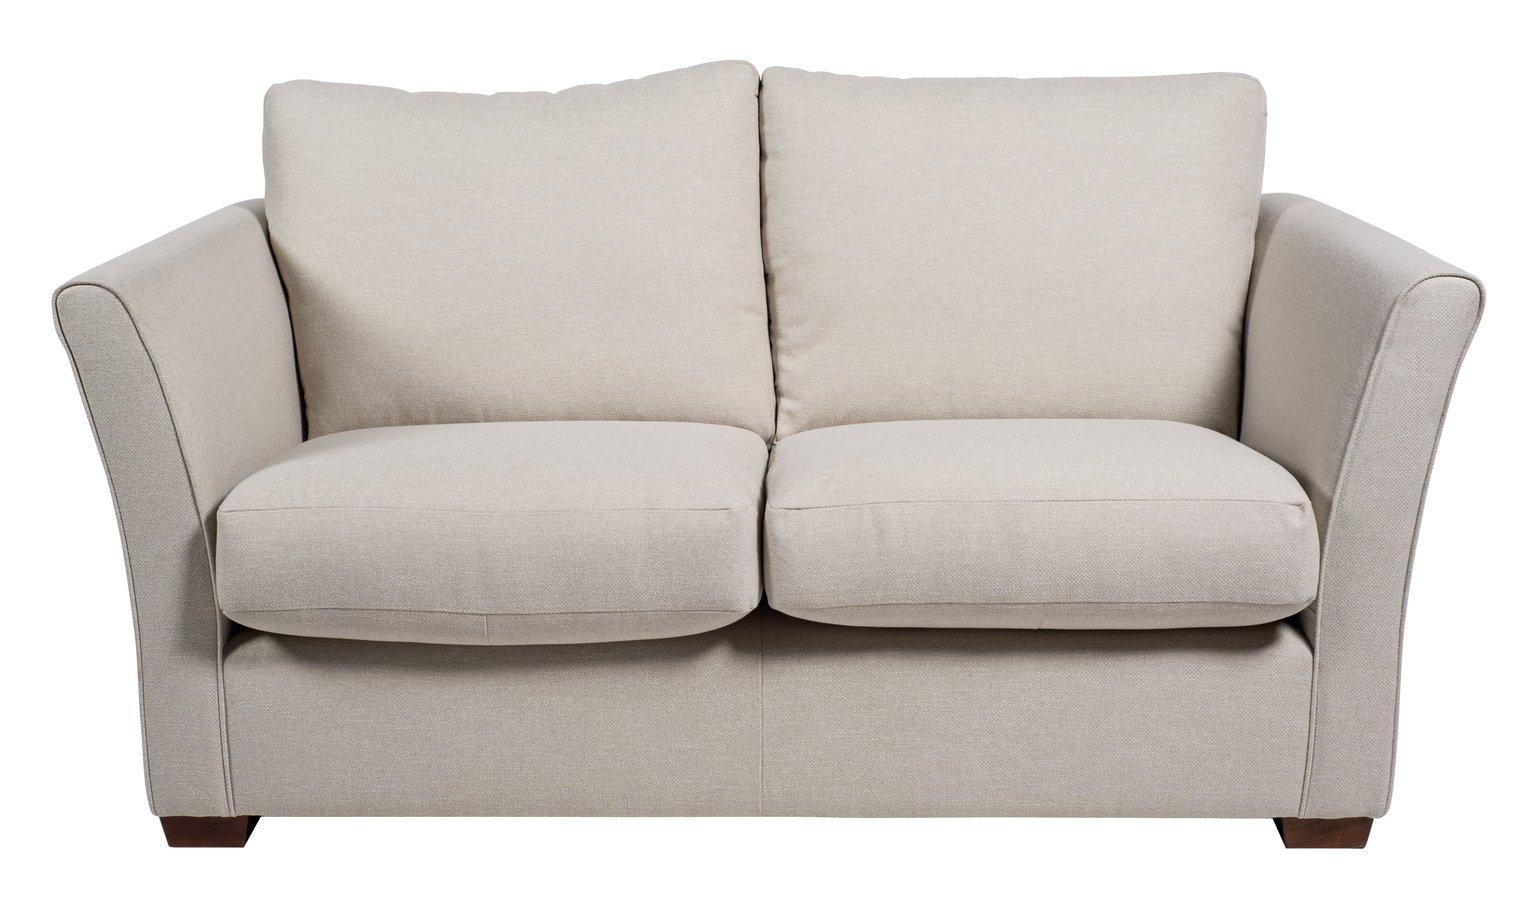 Argos Home Dawson 2 Seater Fabric Sofa - Natural